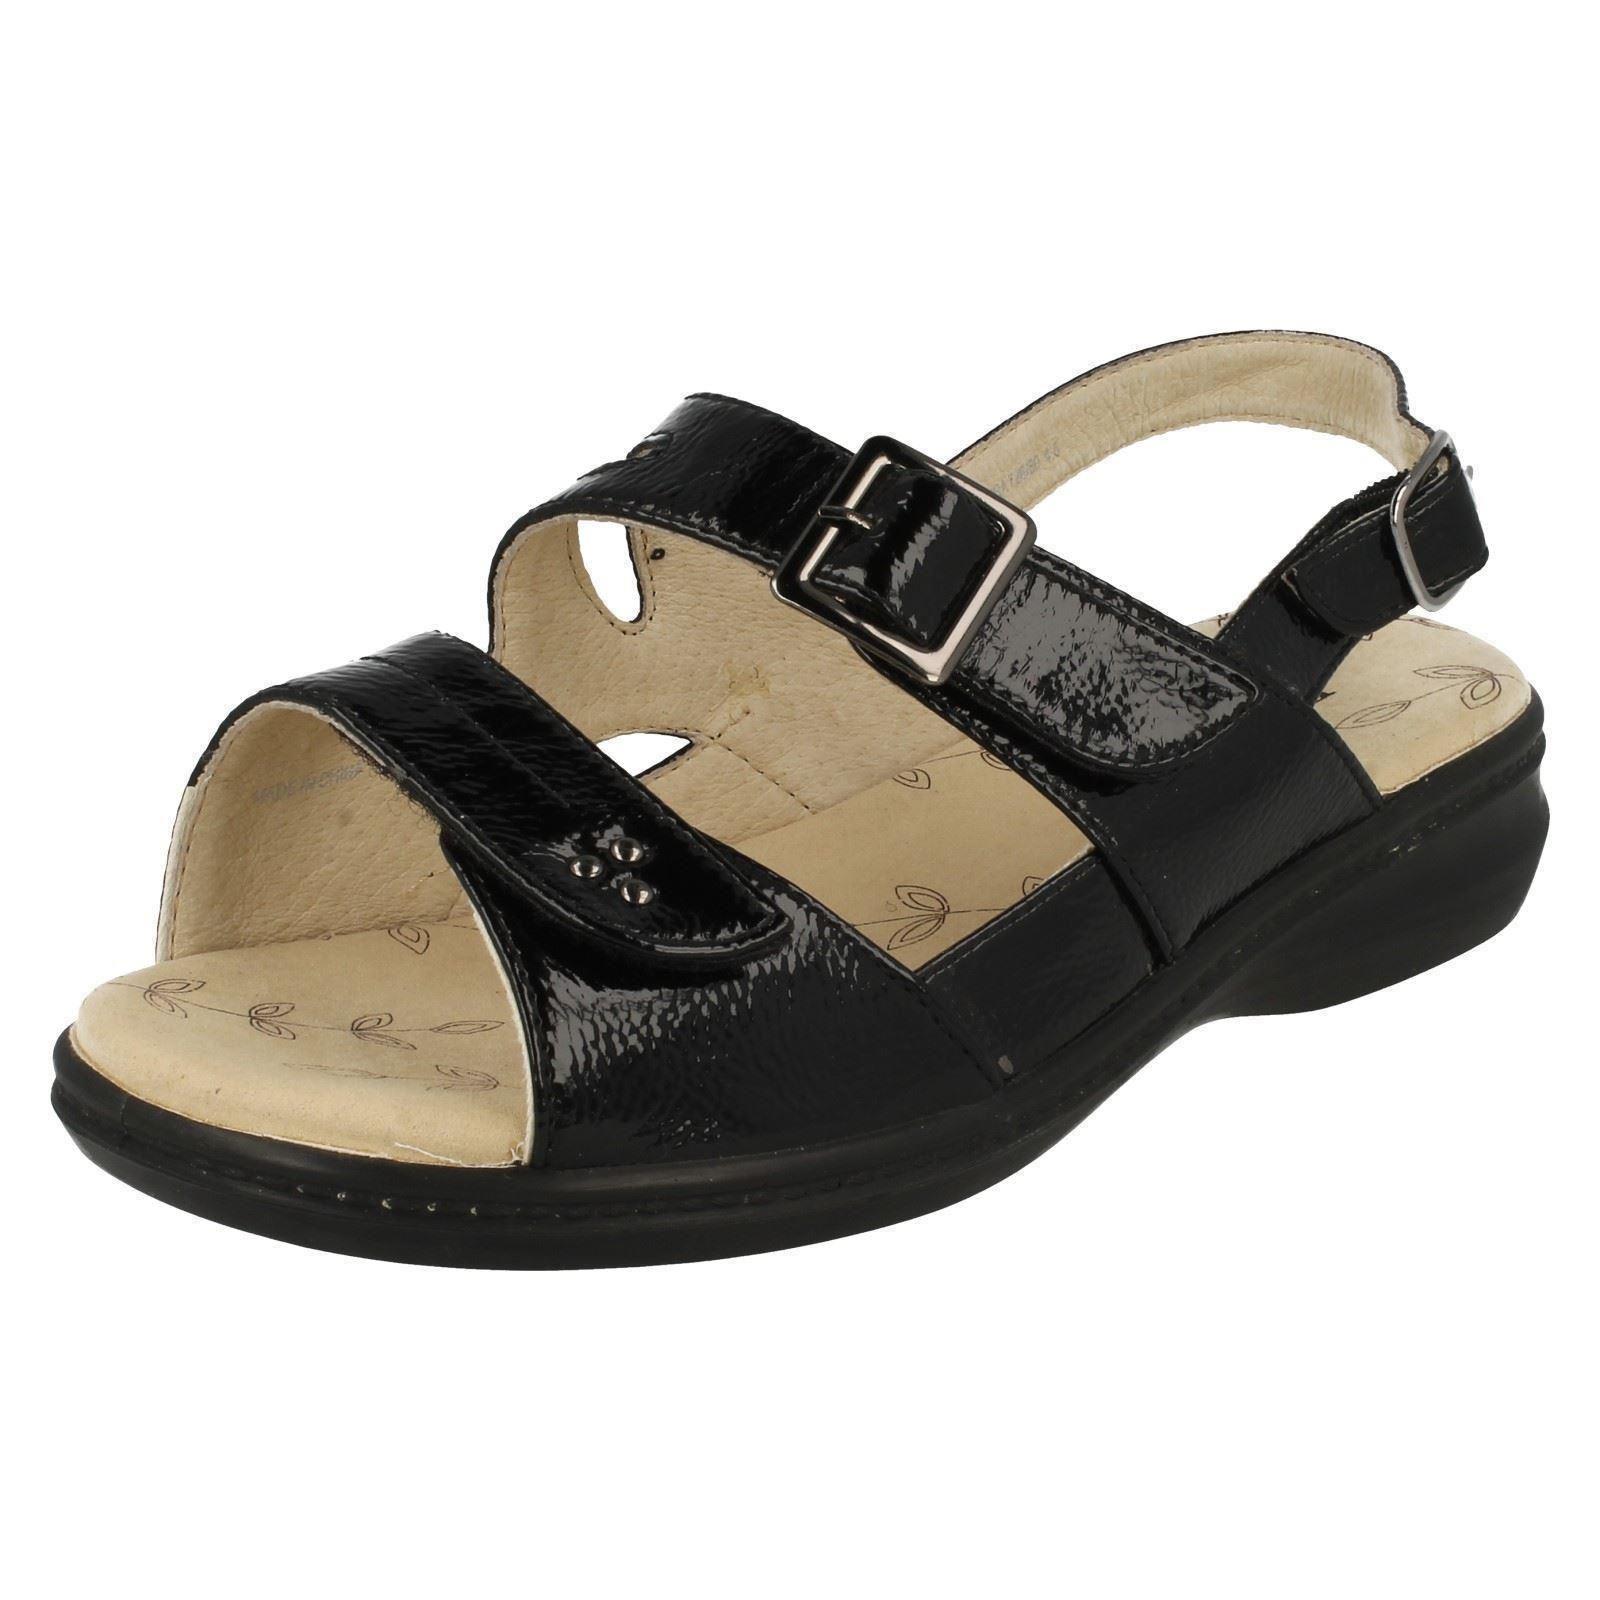 damen padders breite passform sommer sandalen 39 laura 39 ebay. Black Bedroom Furniture Sets. Home Design Ideas